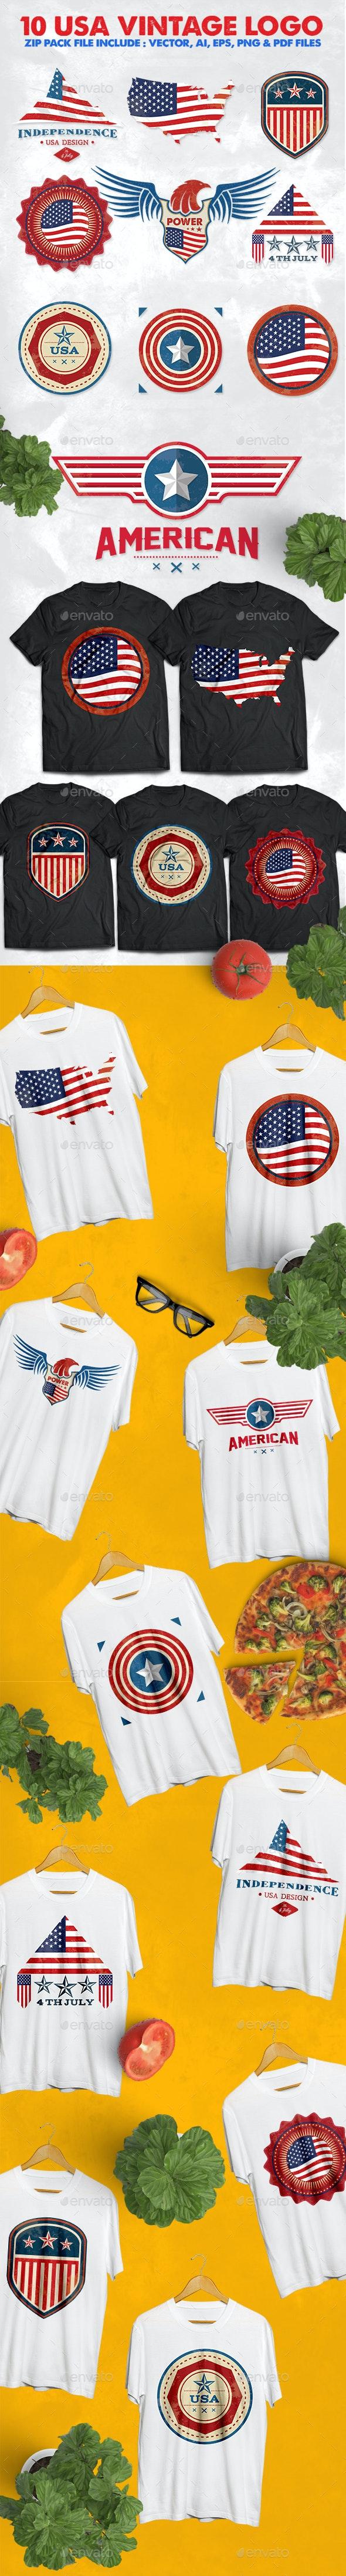 10 USA Vintage Badges Logo - Badges & Stickers Web Elements